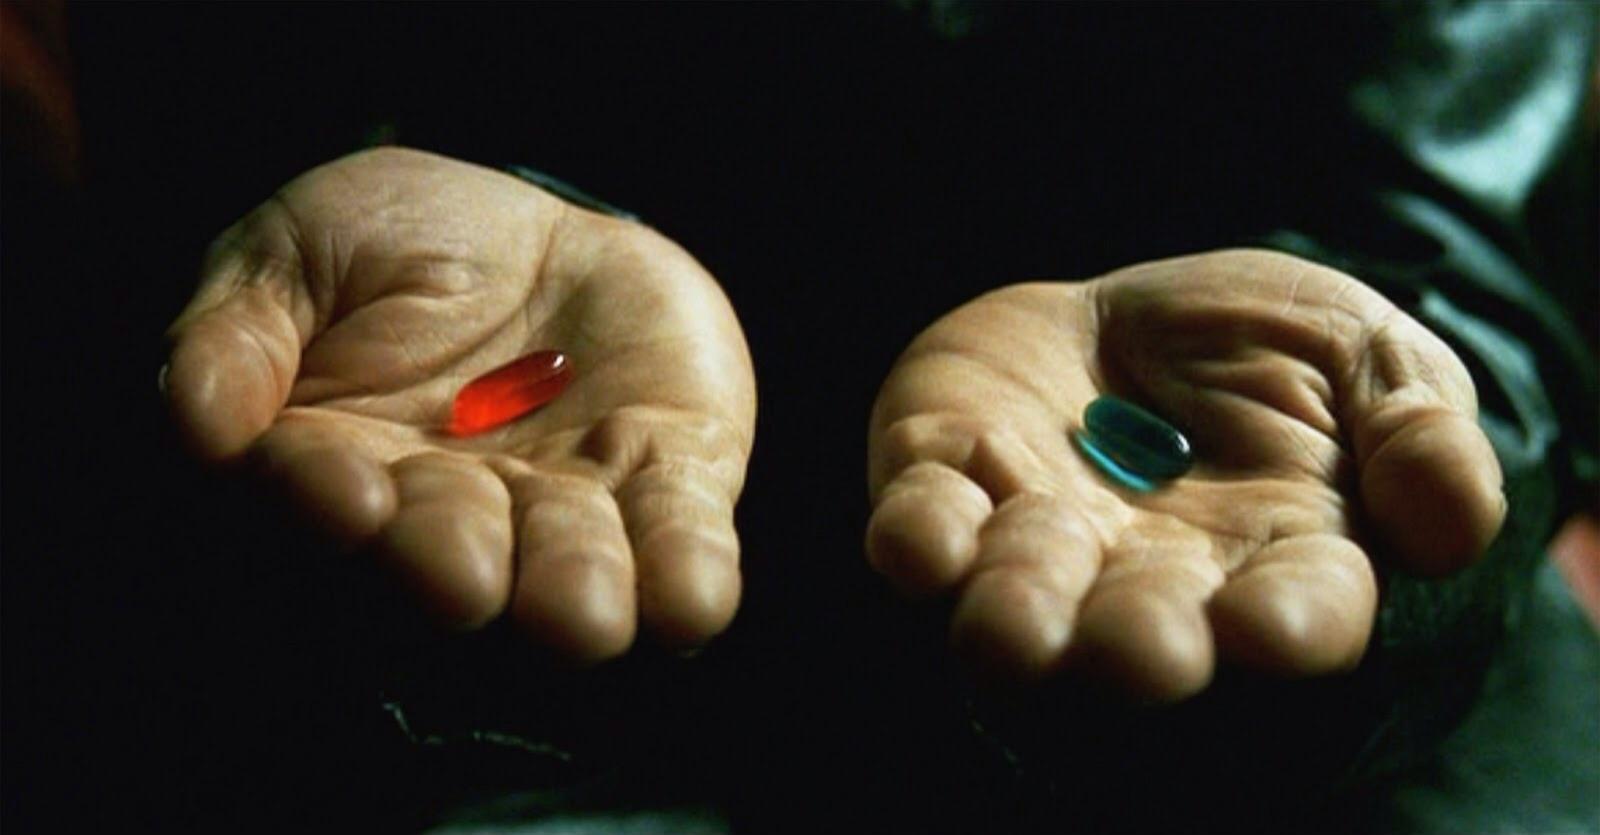 Osprey Dream: The Matrix - Blue Pill or Red Pill?